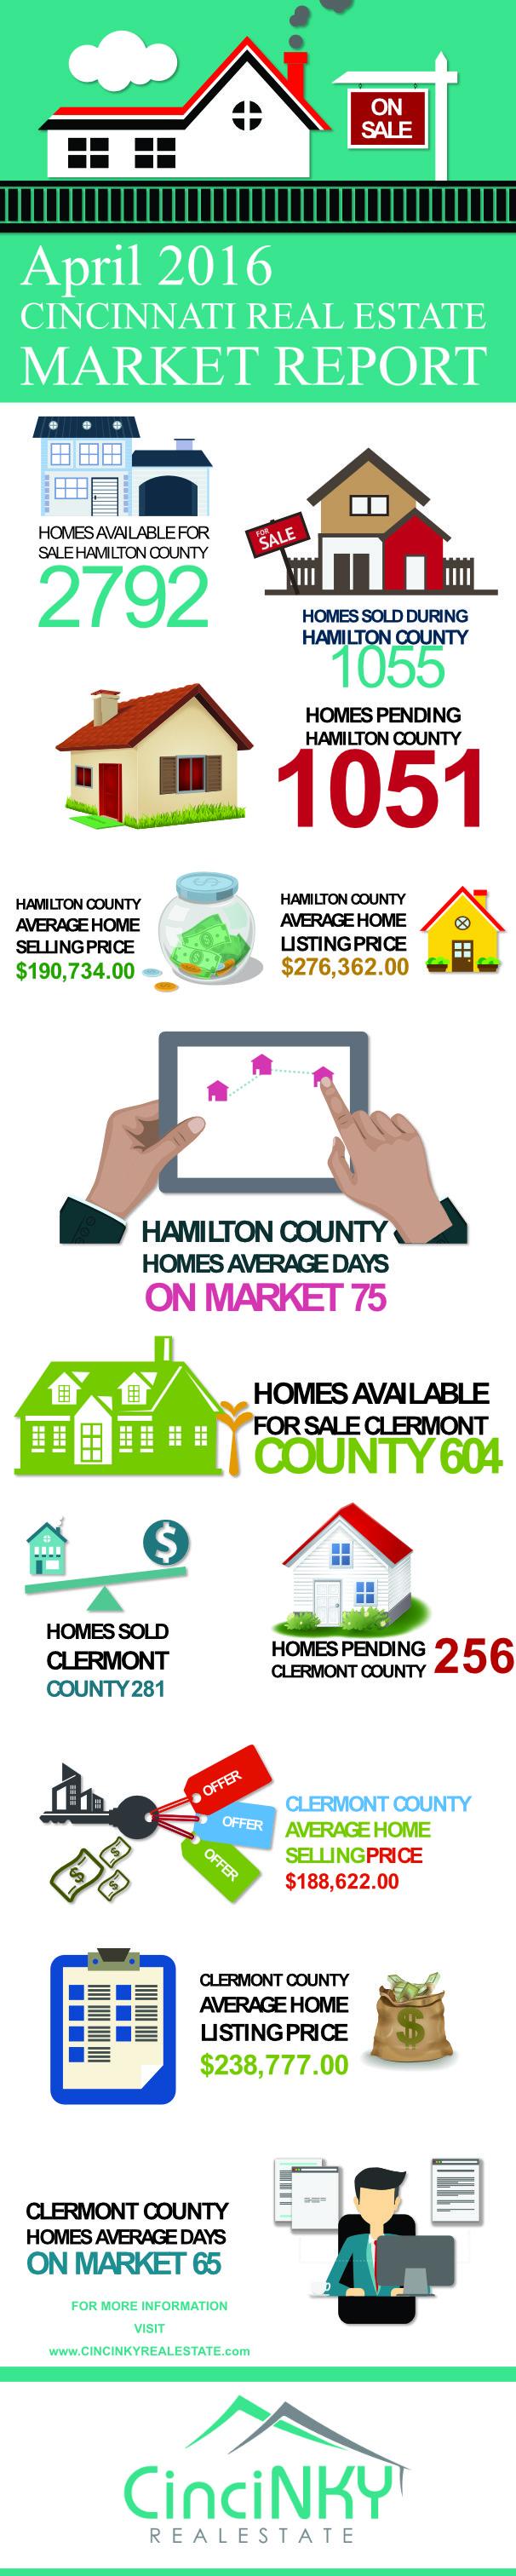 April 2016 Greater Cincinnati Real Estate Market Report Infographic